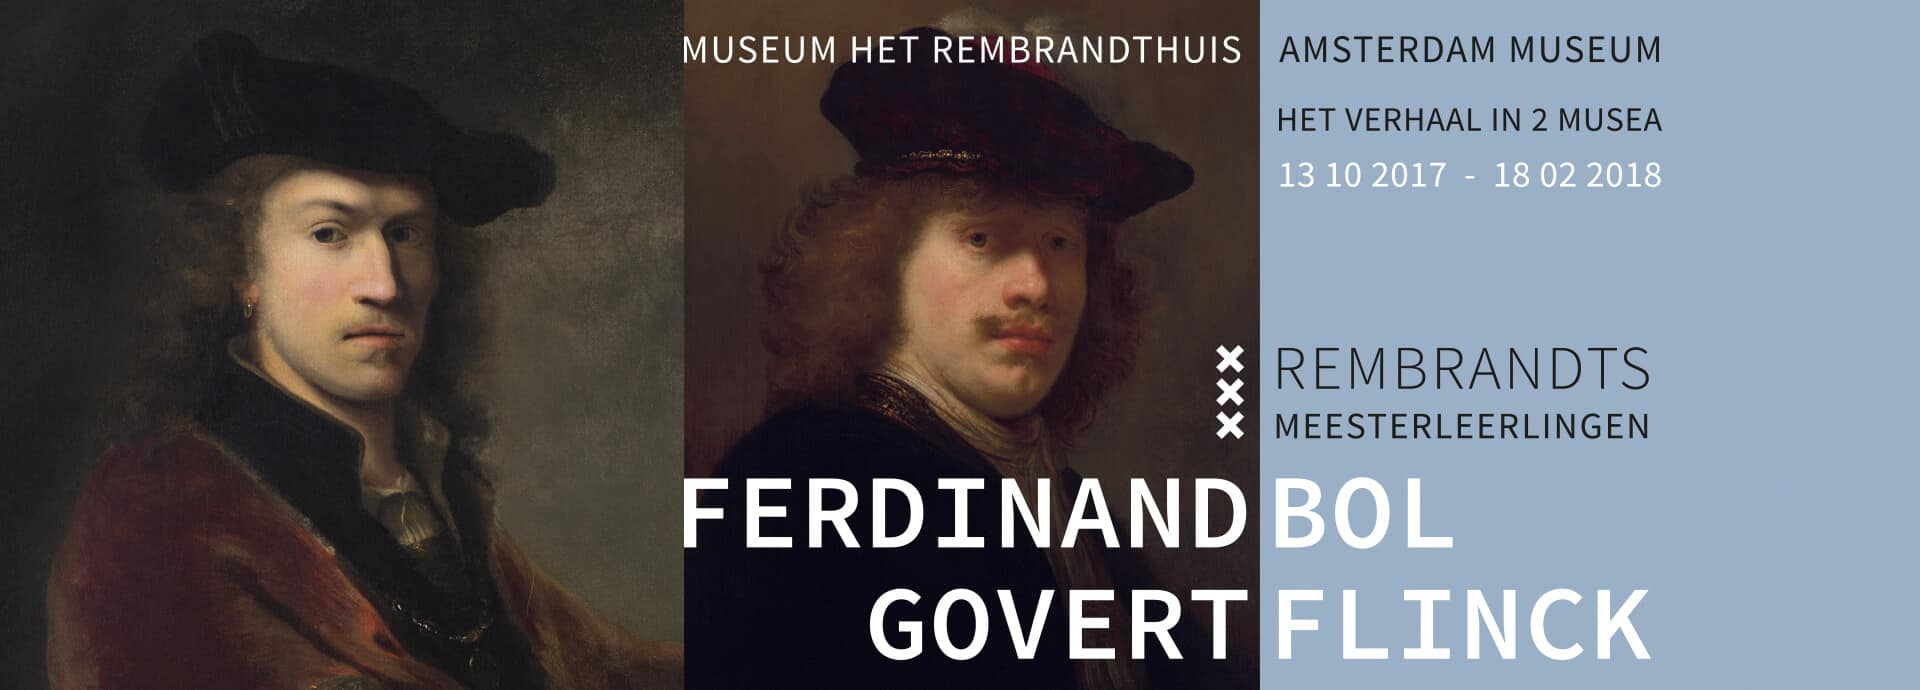 Ferdinand Bol and Govert Flinck